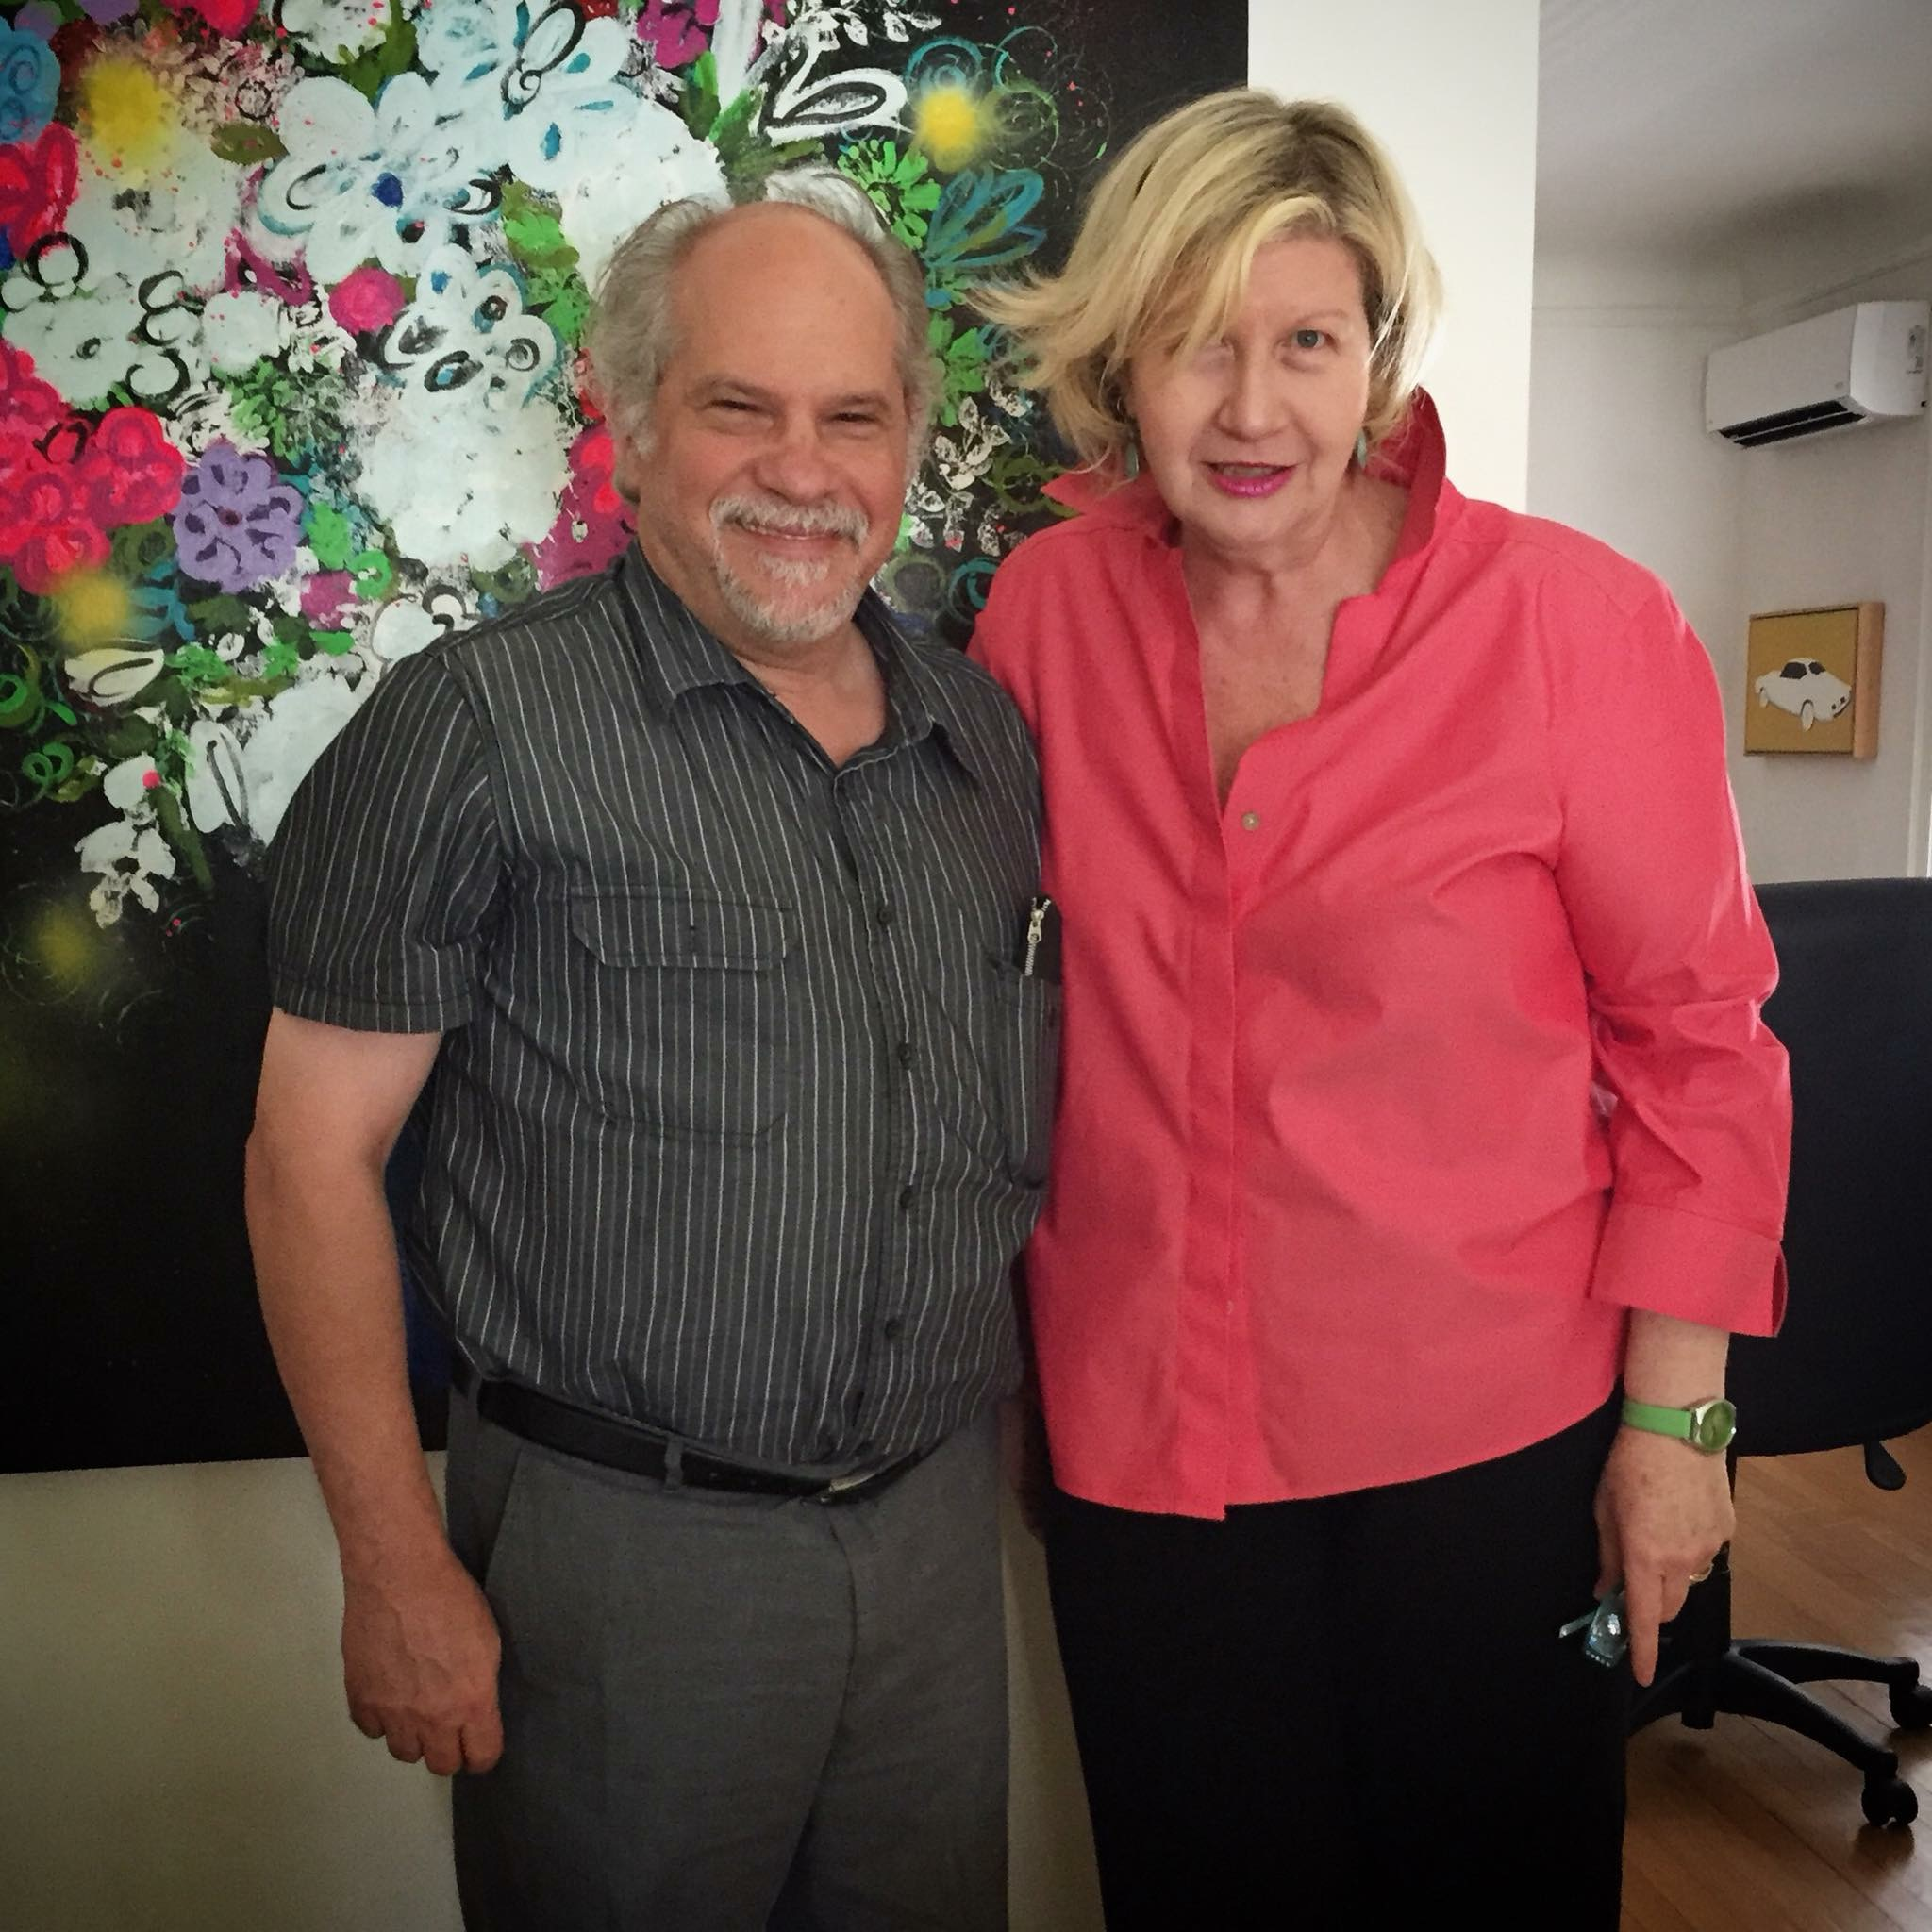 Jim Yood and Lorraine Peltz. Chicago, August 5, 2015.